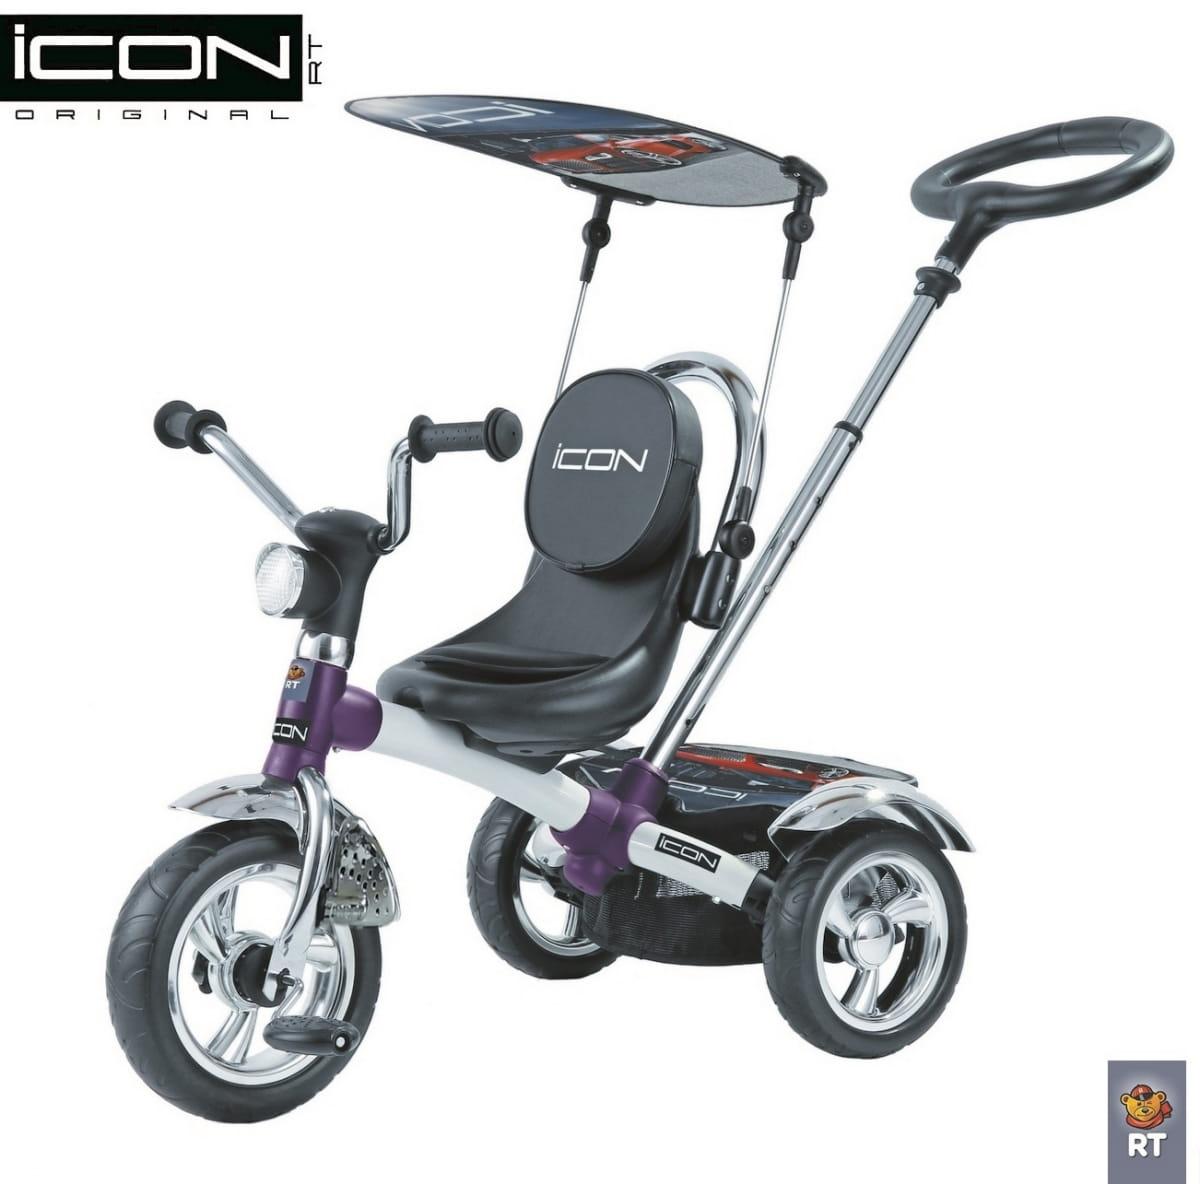 Трехколесный велосипед Icon 3677 4 White pearl car